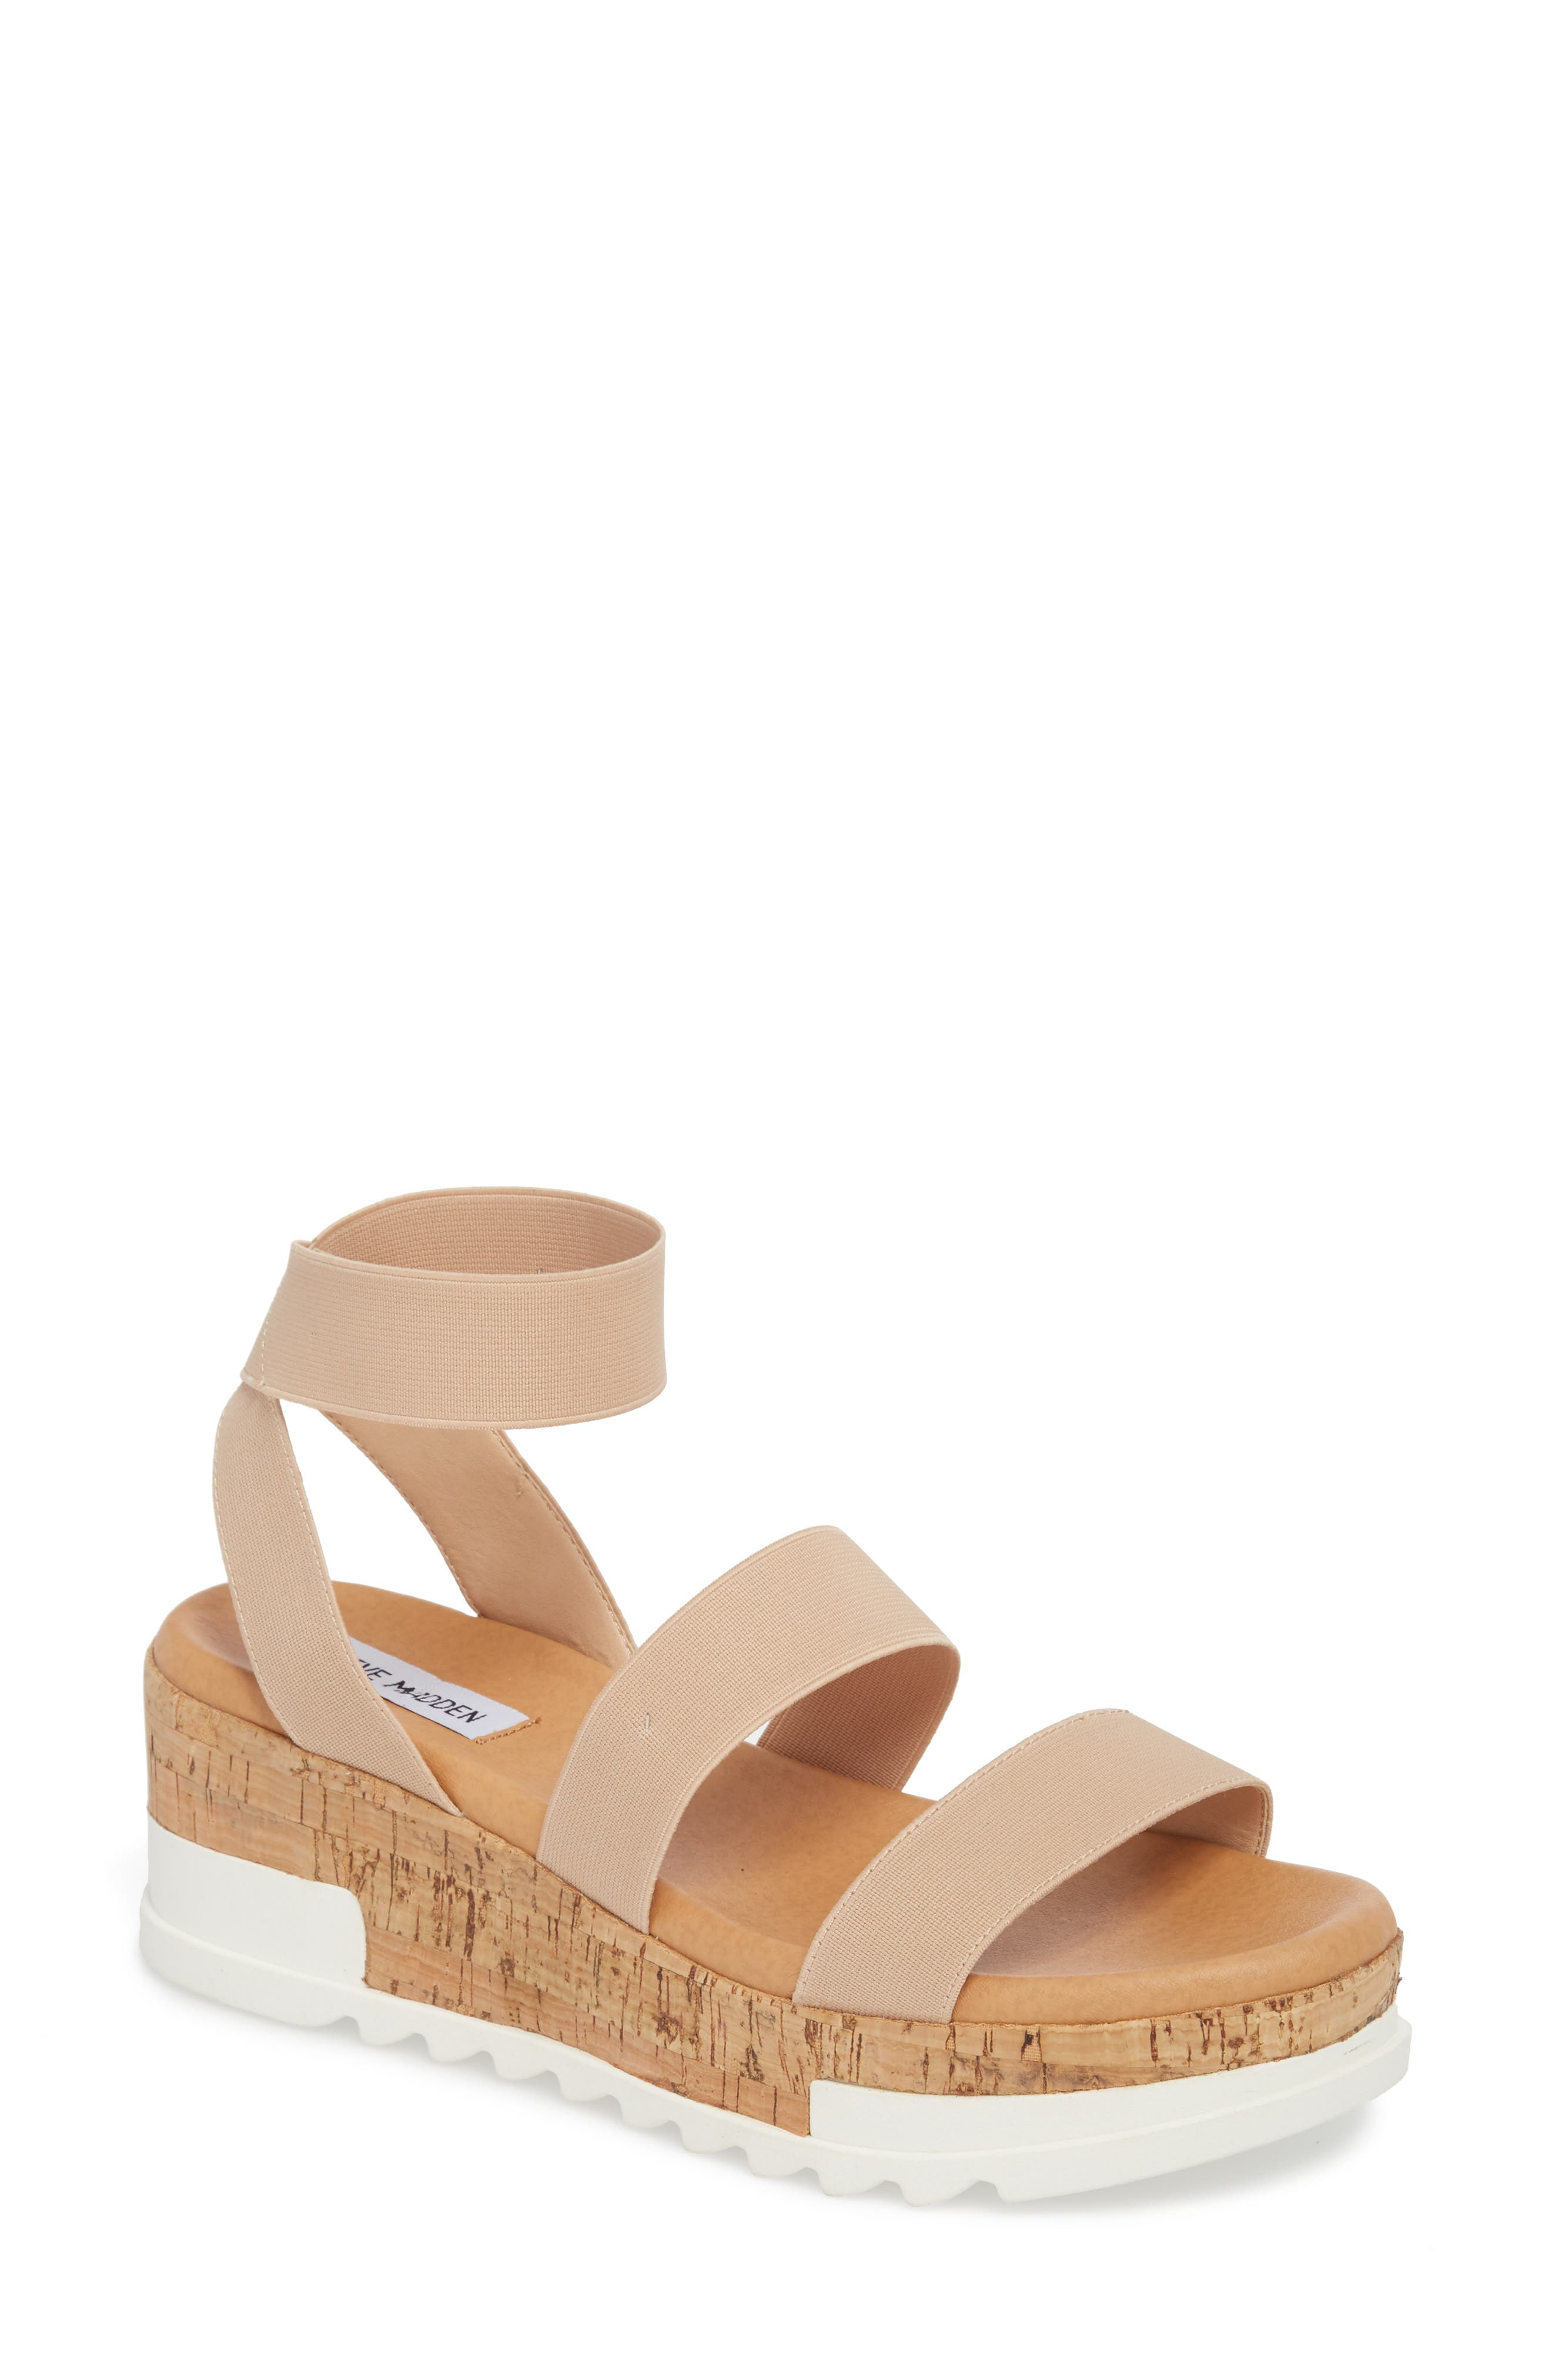 Bandi Platform Wedge Sandal,                             Main thumbnail 1, color,                             BLUSH